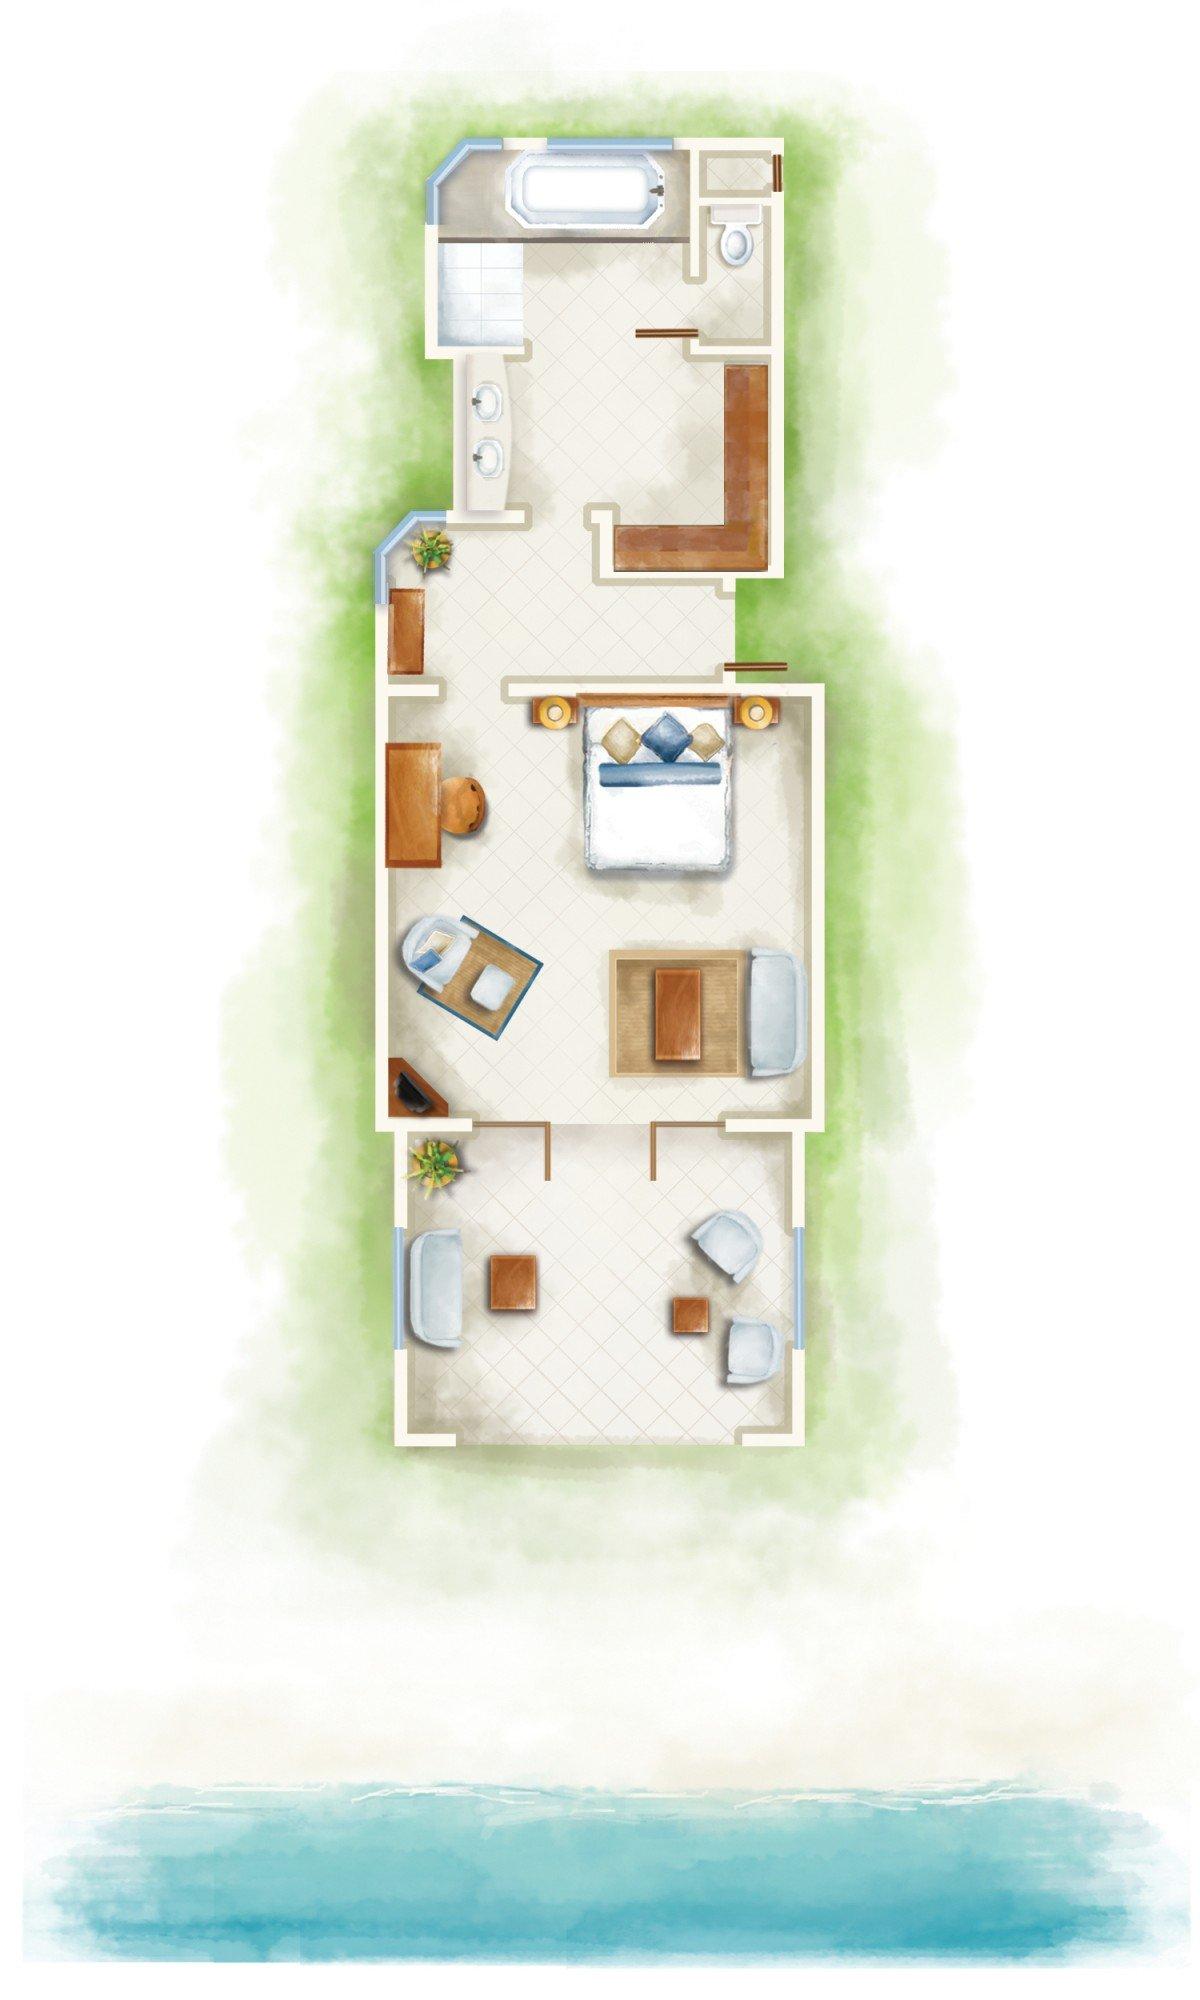 Tropical Beachfront Room (76 m²)